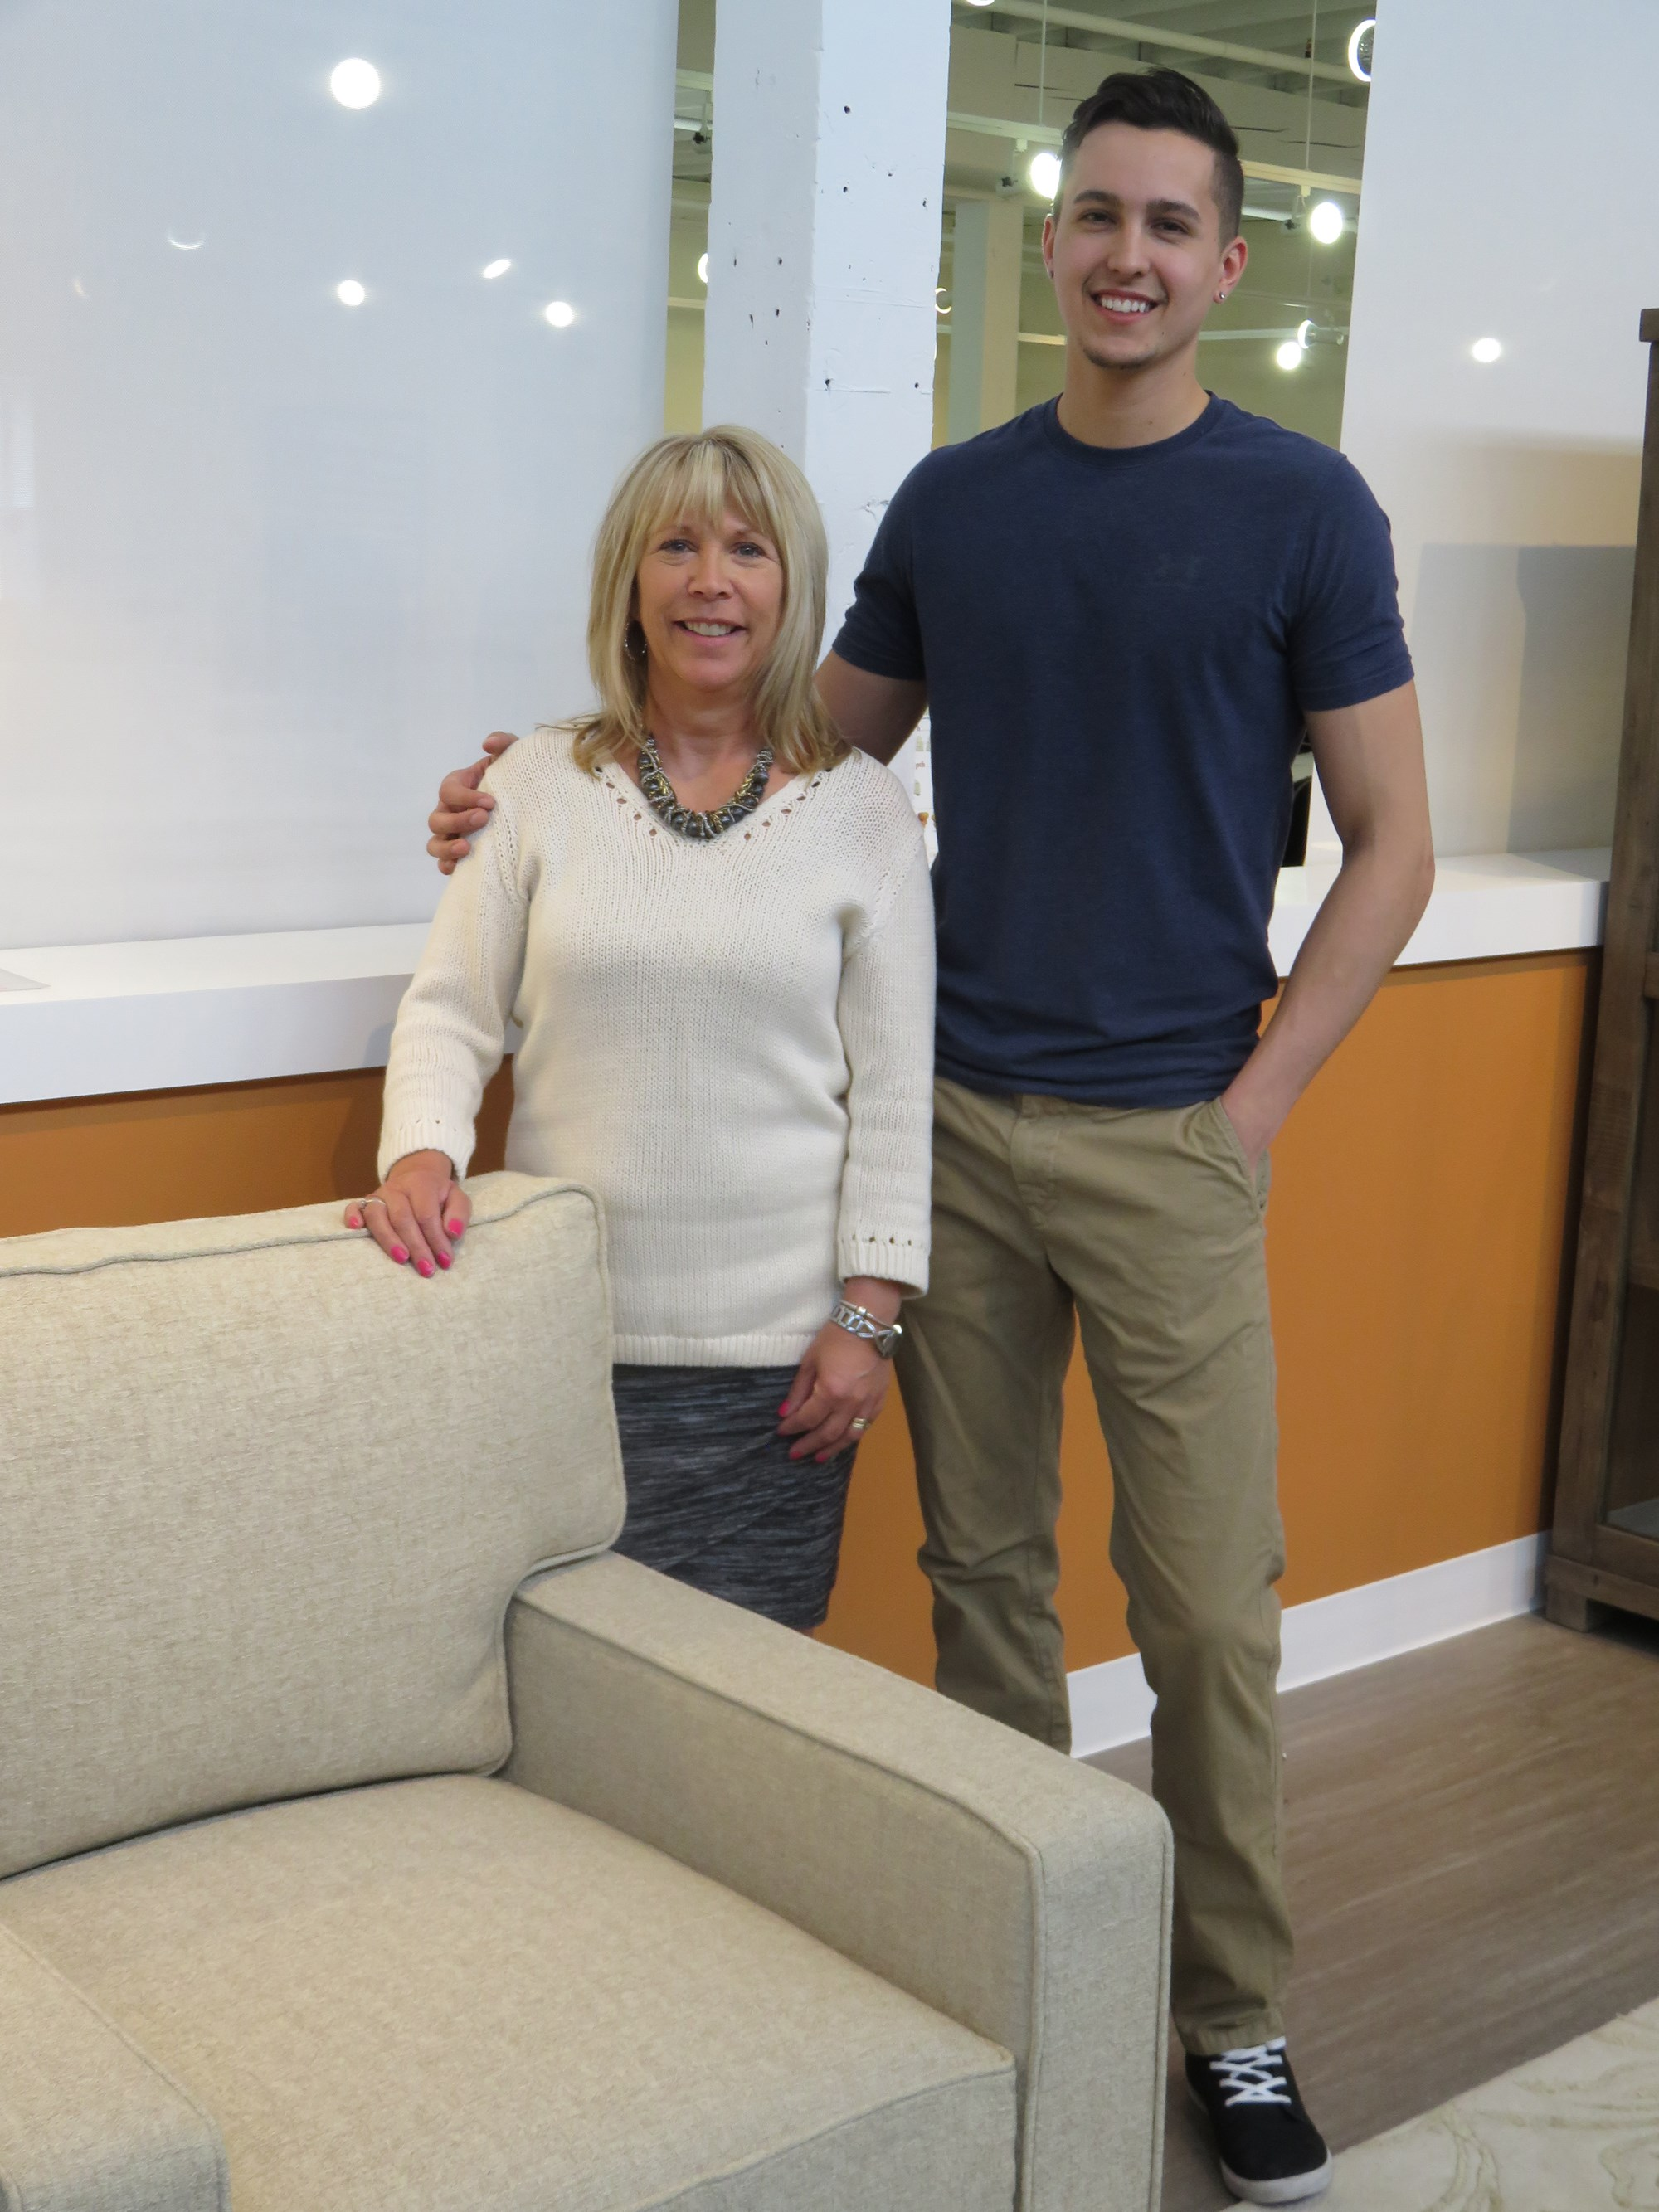 Photo Of People With Hallagan Furniture